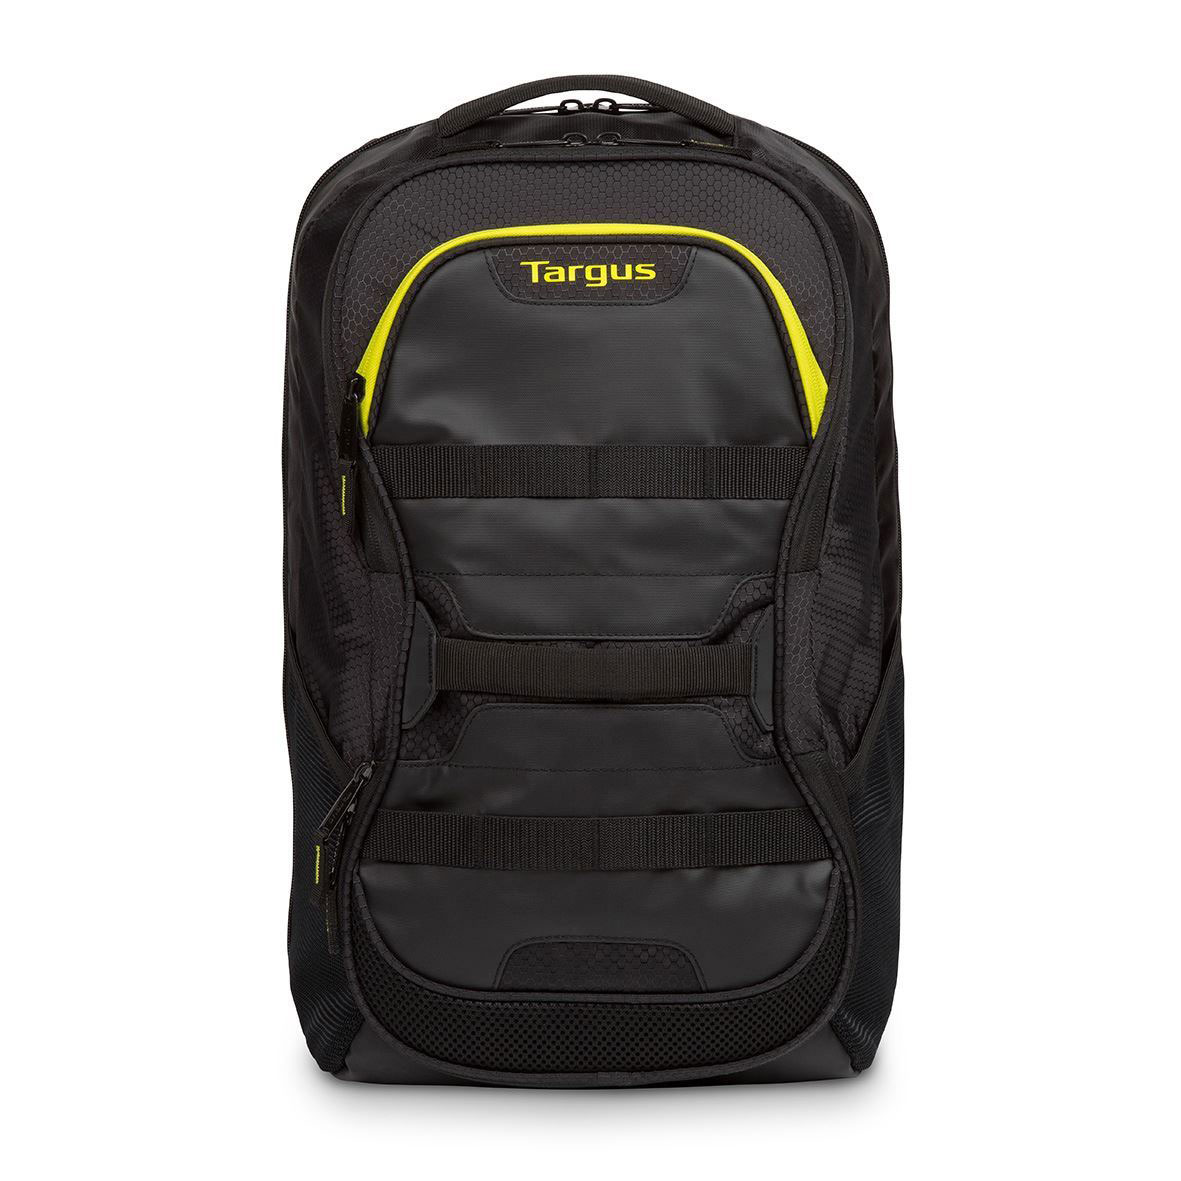 "Stamina 15.6"" Laptop Backpack Targus - Sac et sacoche - 7"